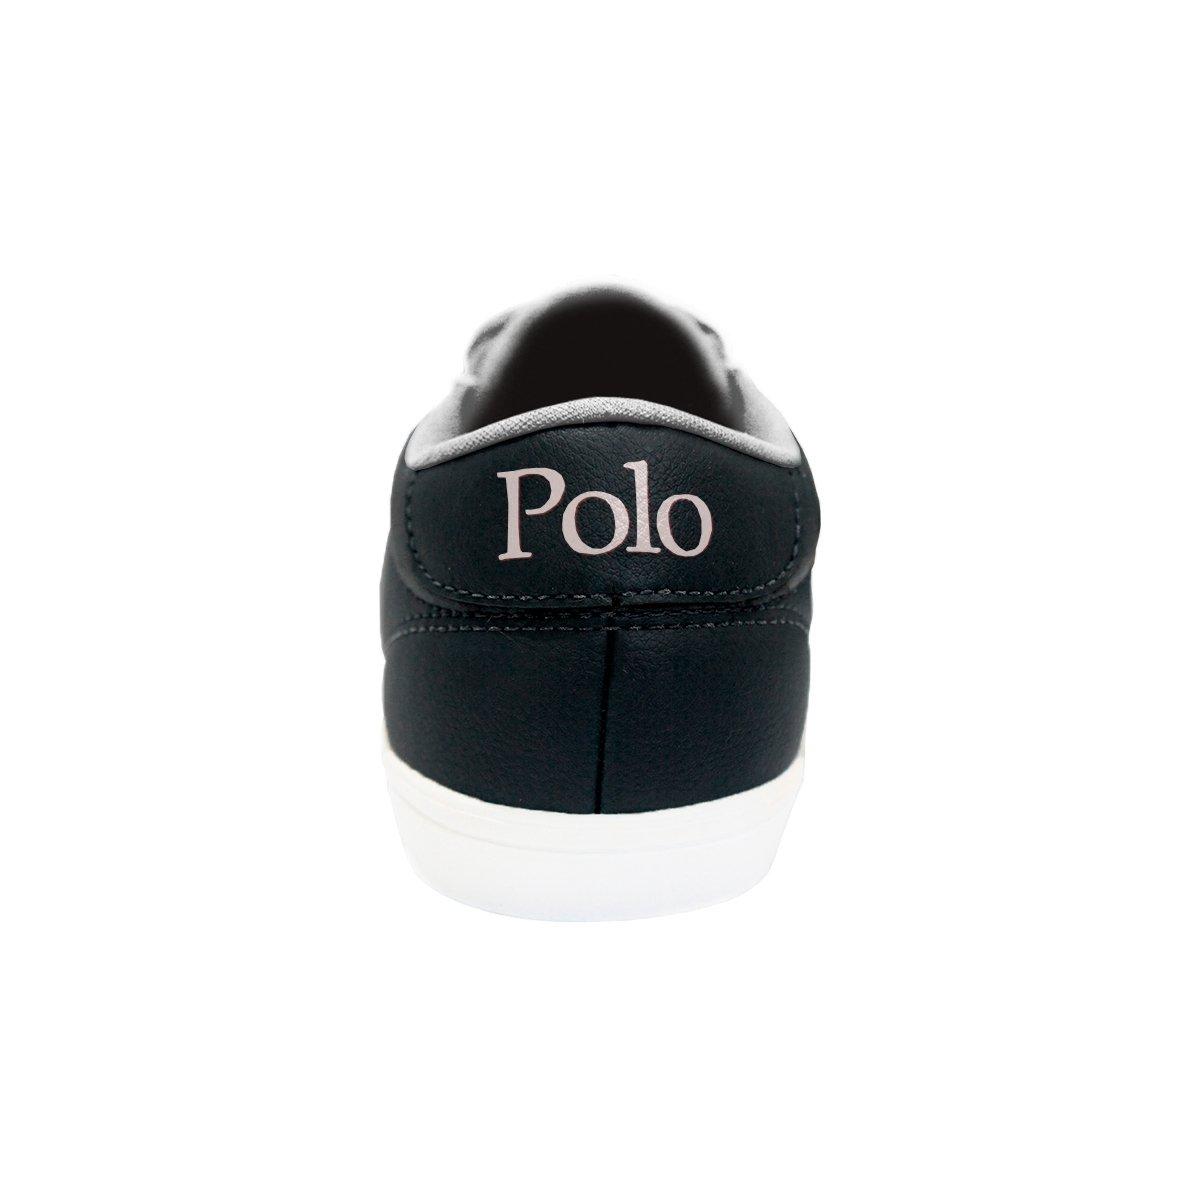 Preto Masculino Sapatênis Leeds Polo Sapatênis Match Polo 0qZRwR